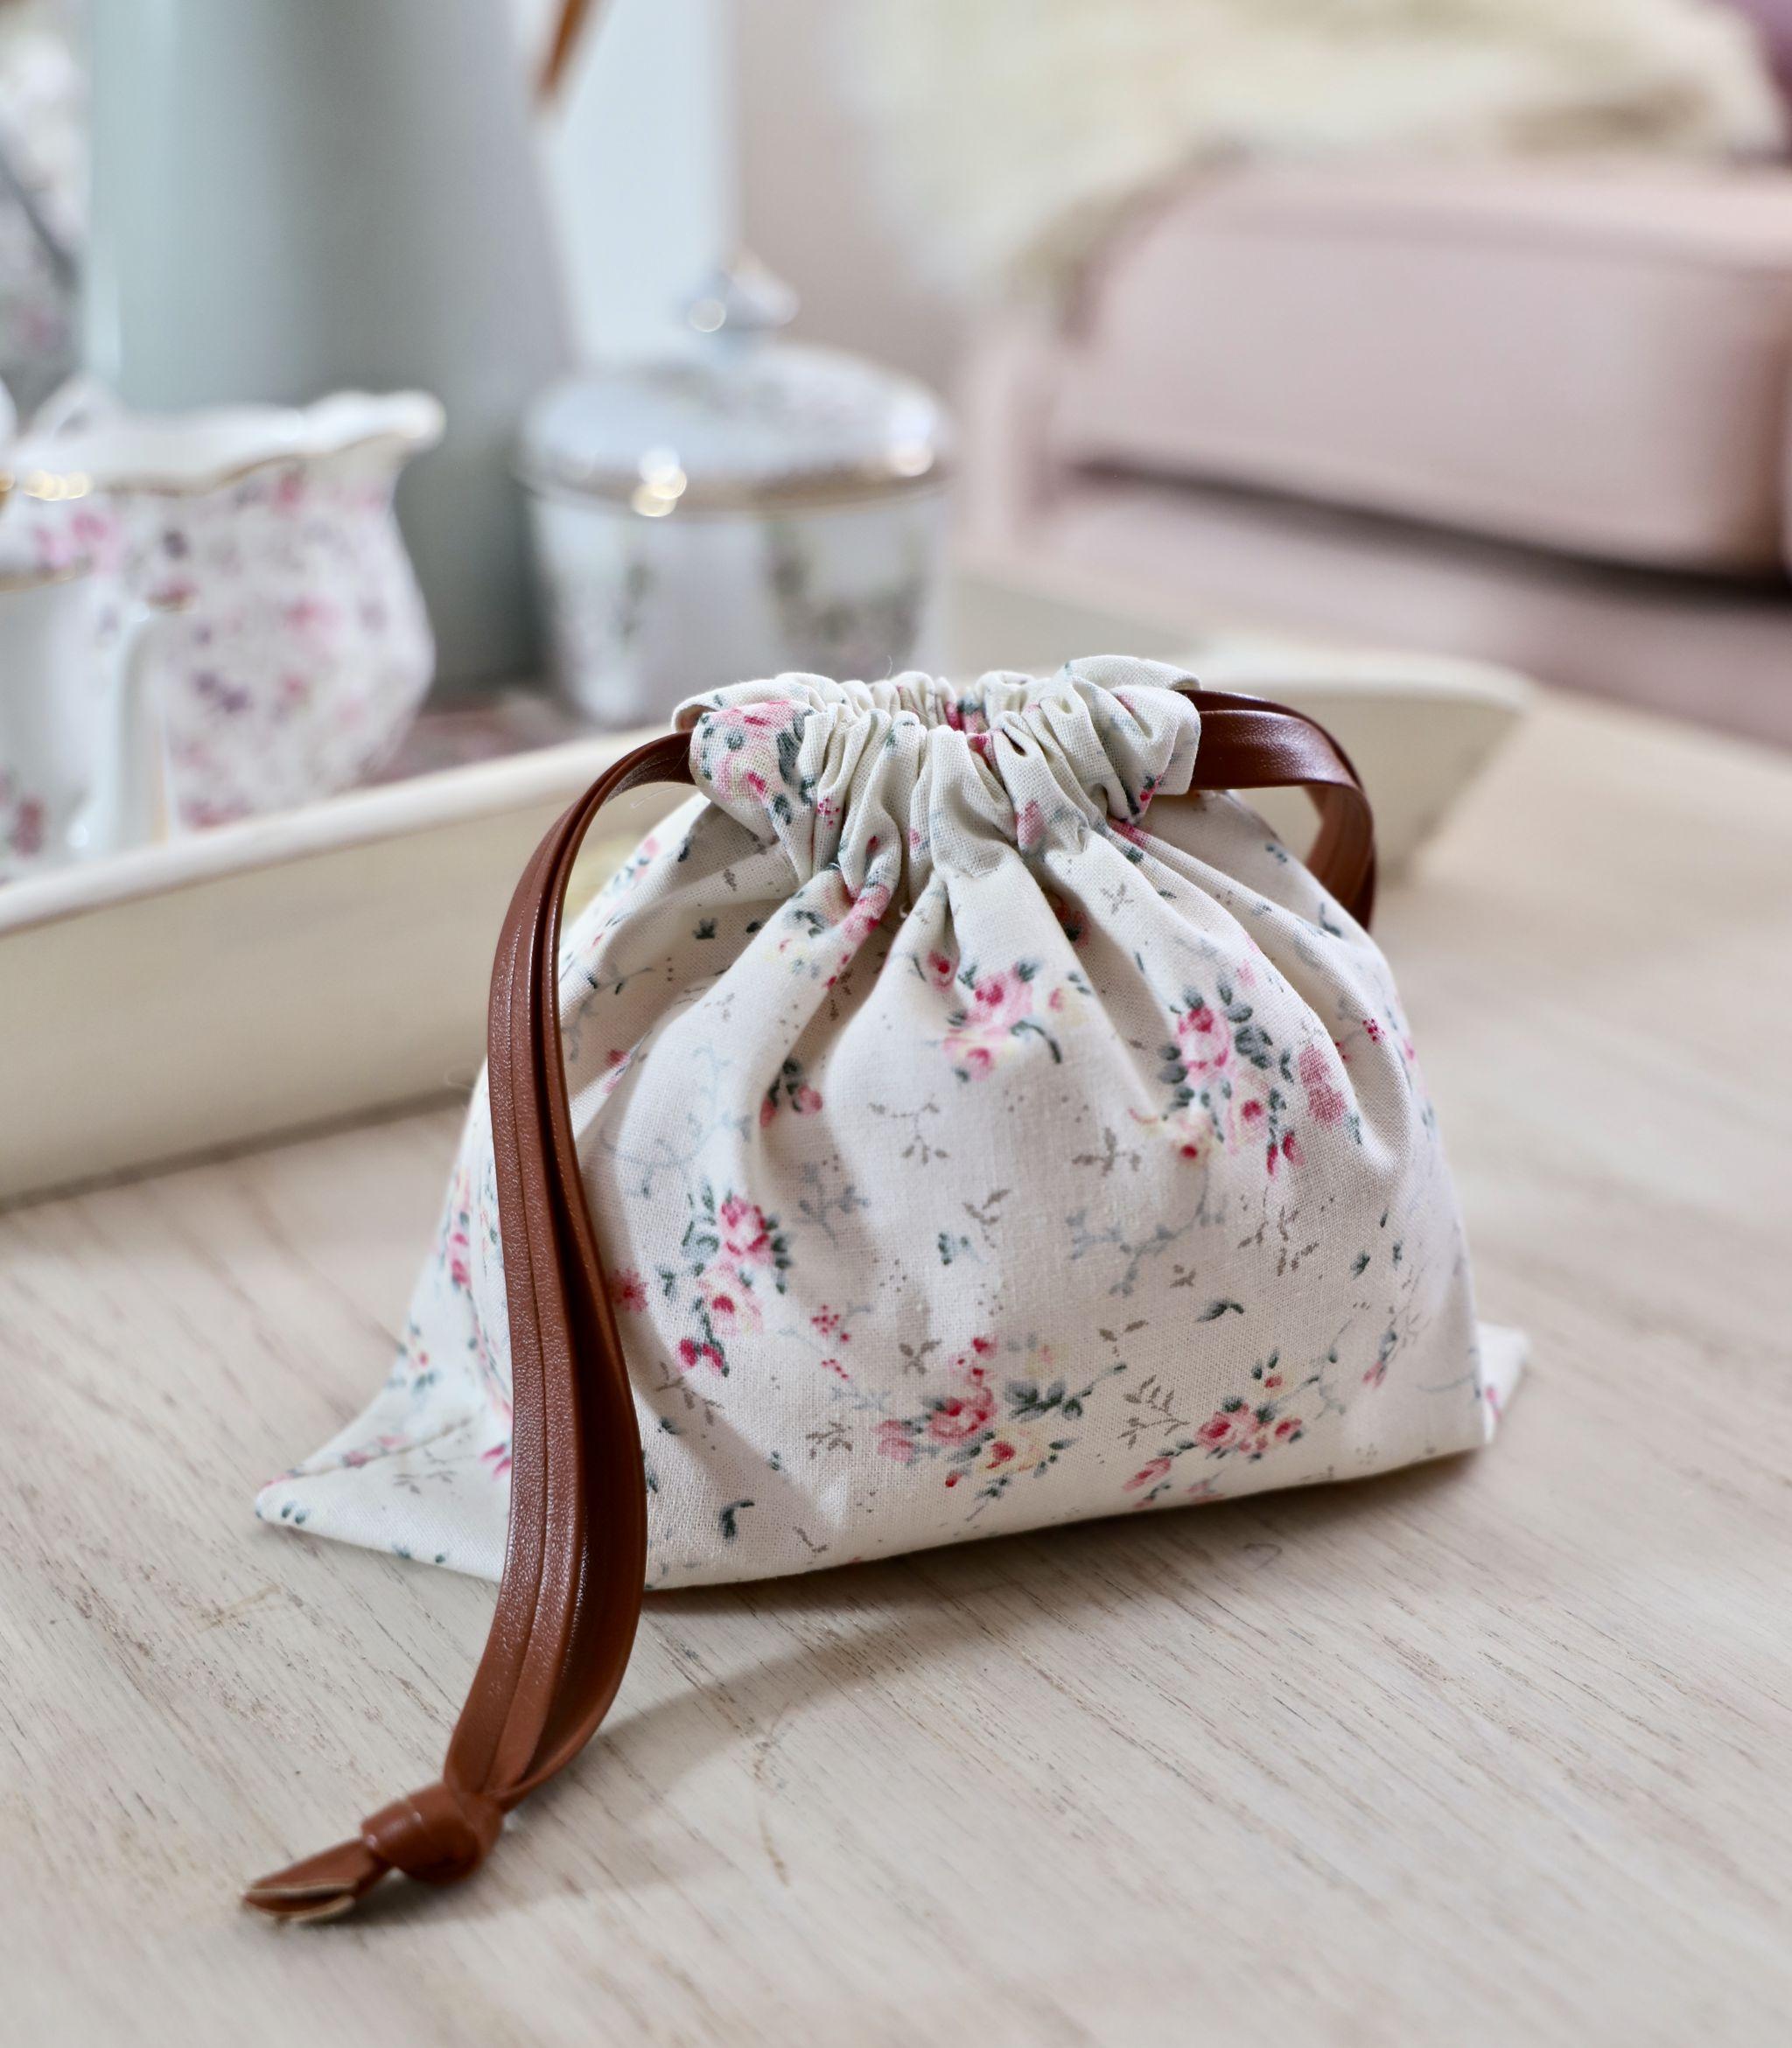 DIY drawstring bag, easy beginners sewing project